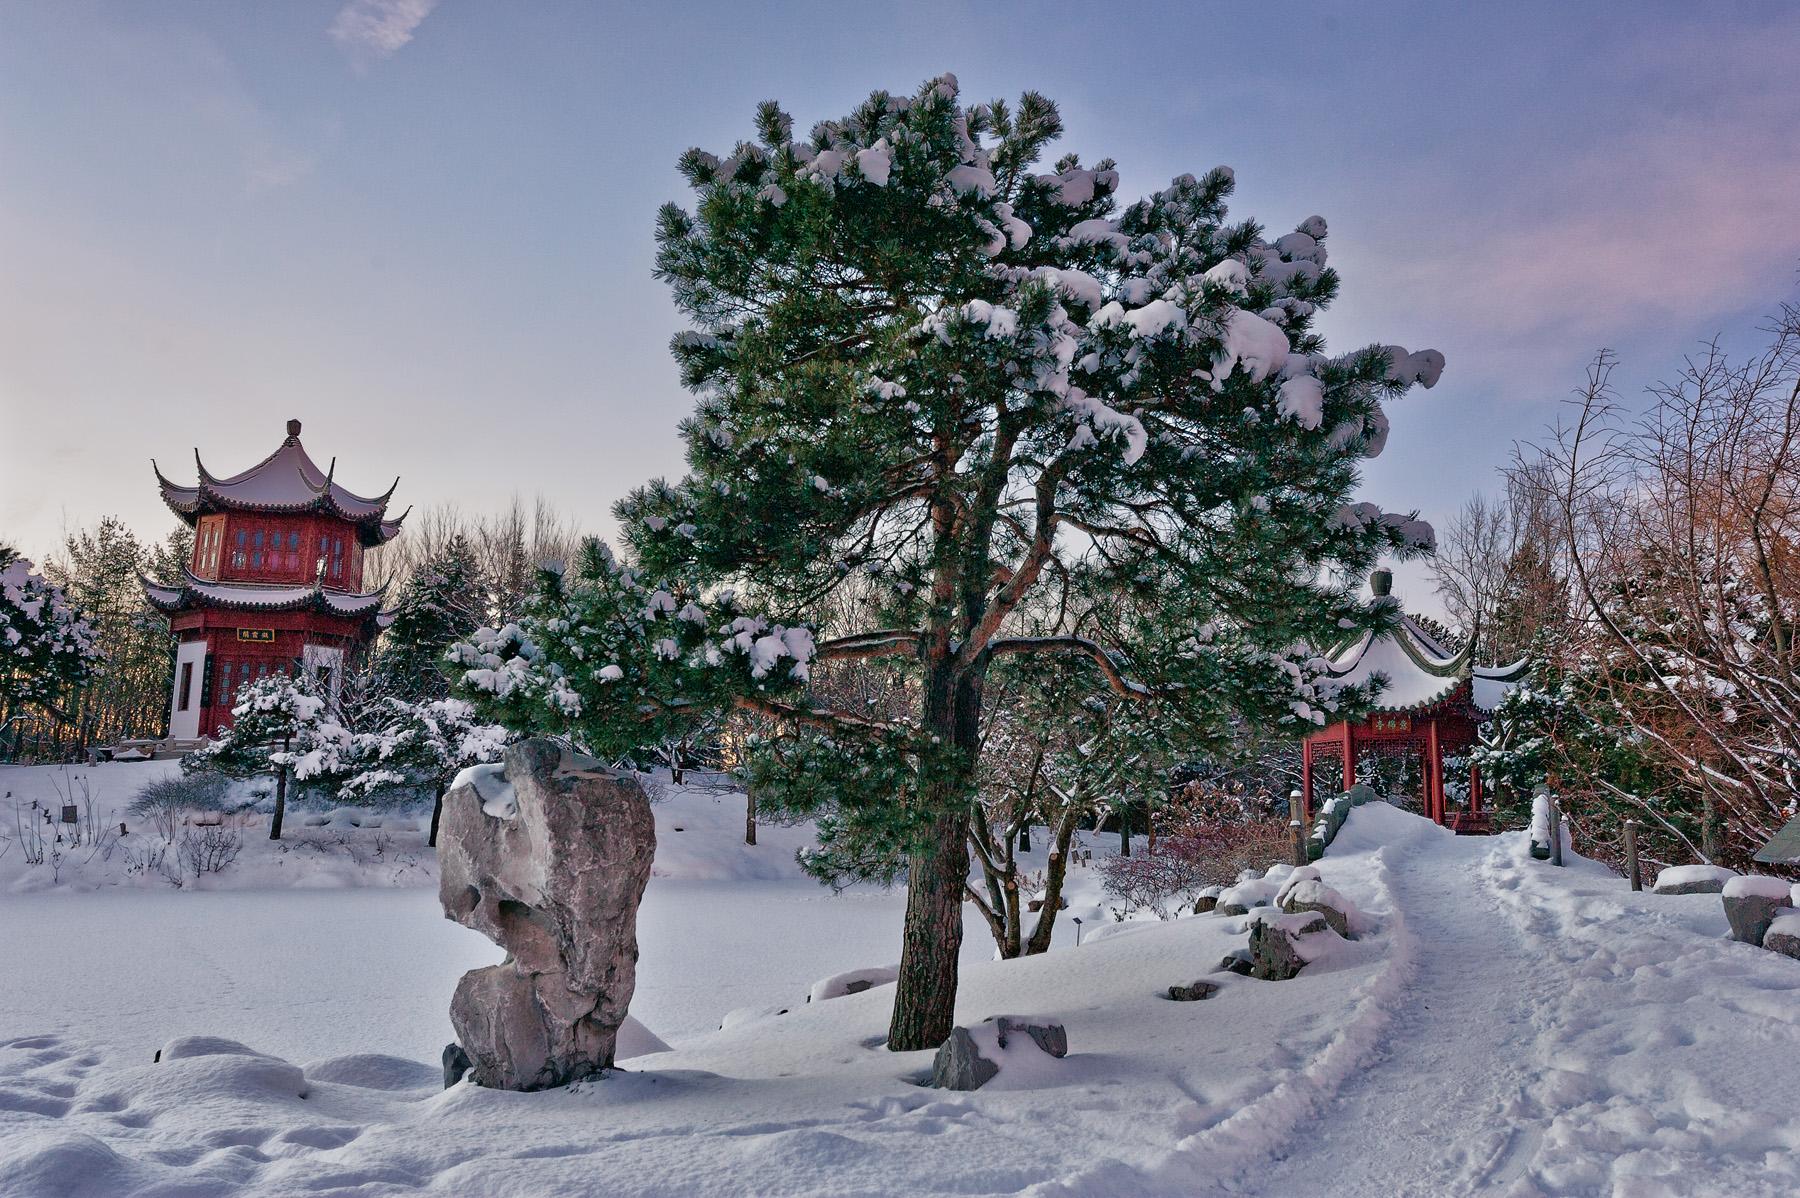 editorial-travel-montreal-botanical-garden-snow-winter-dusk-011